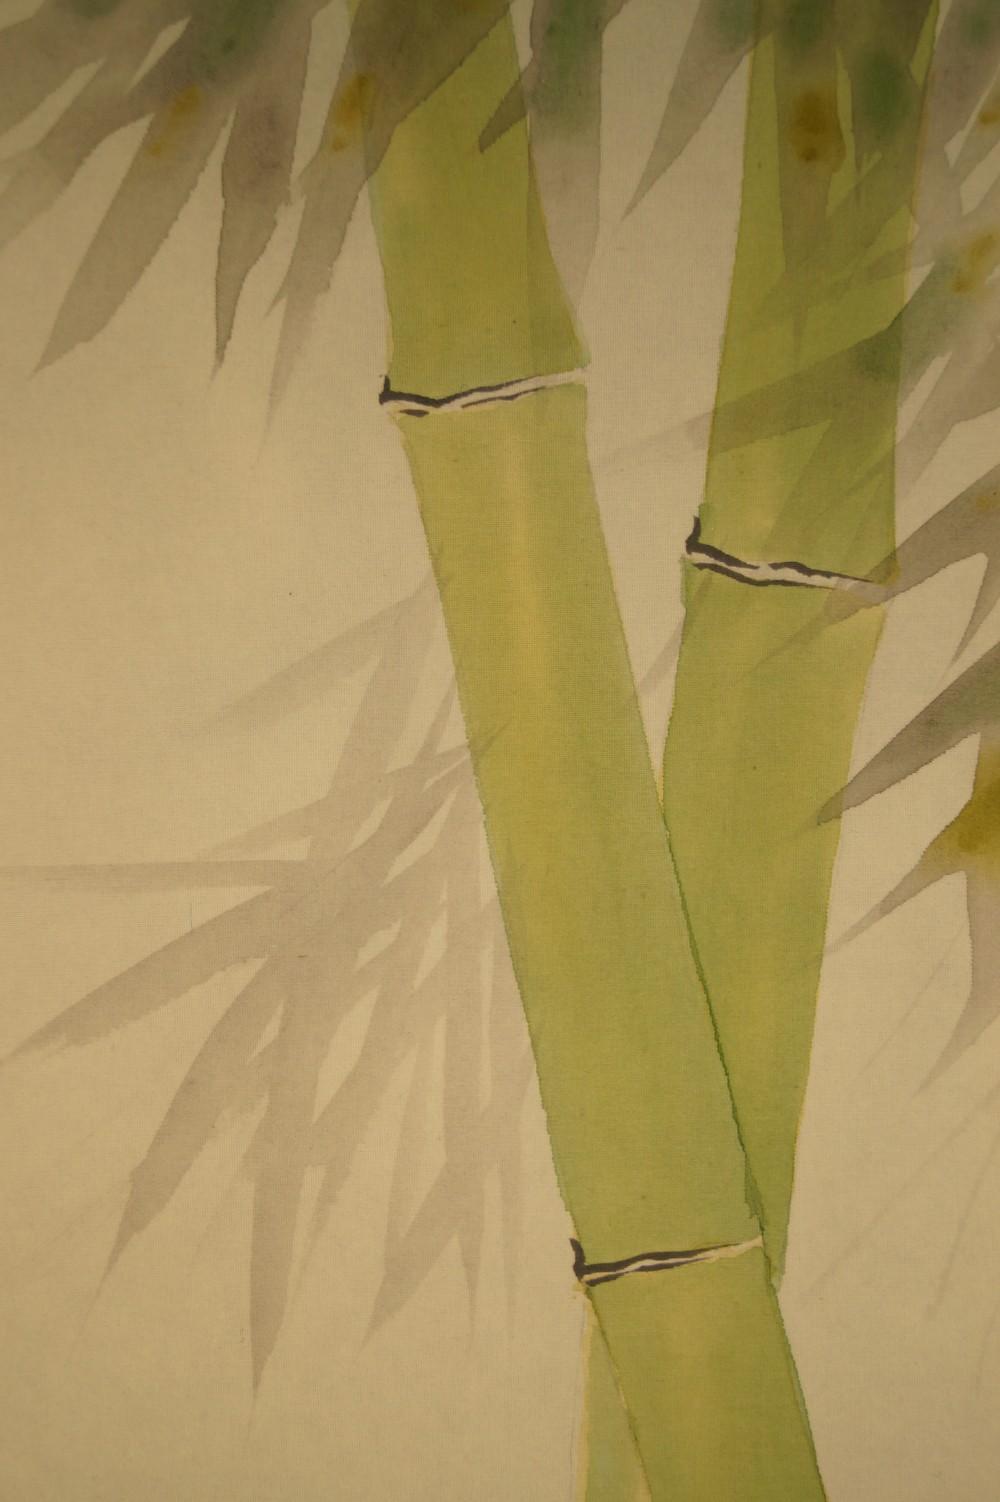 Spatzen am Bambusstrauch - japanisches Rollgemälde (Kakejiku, Kakemono)